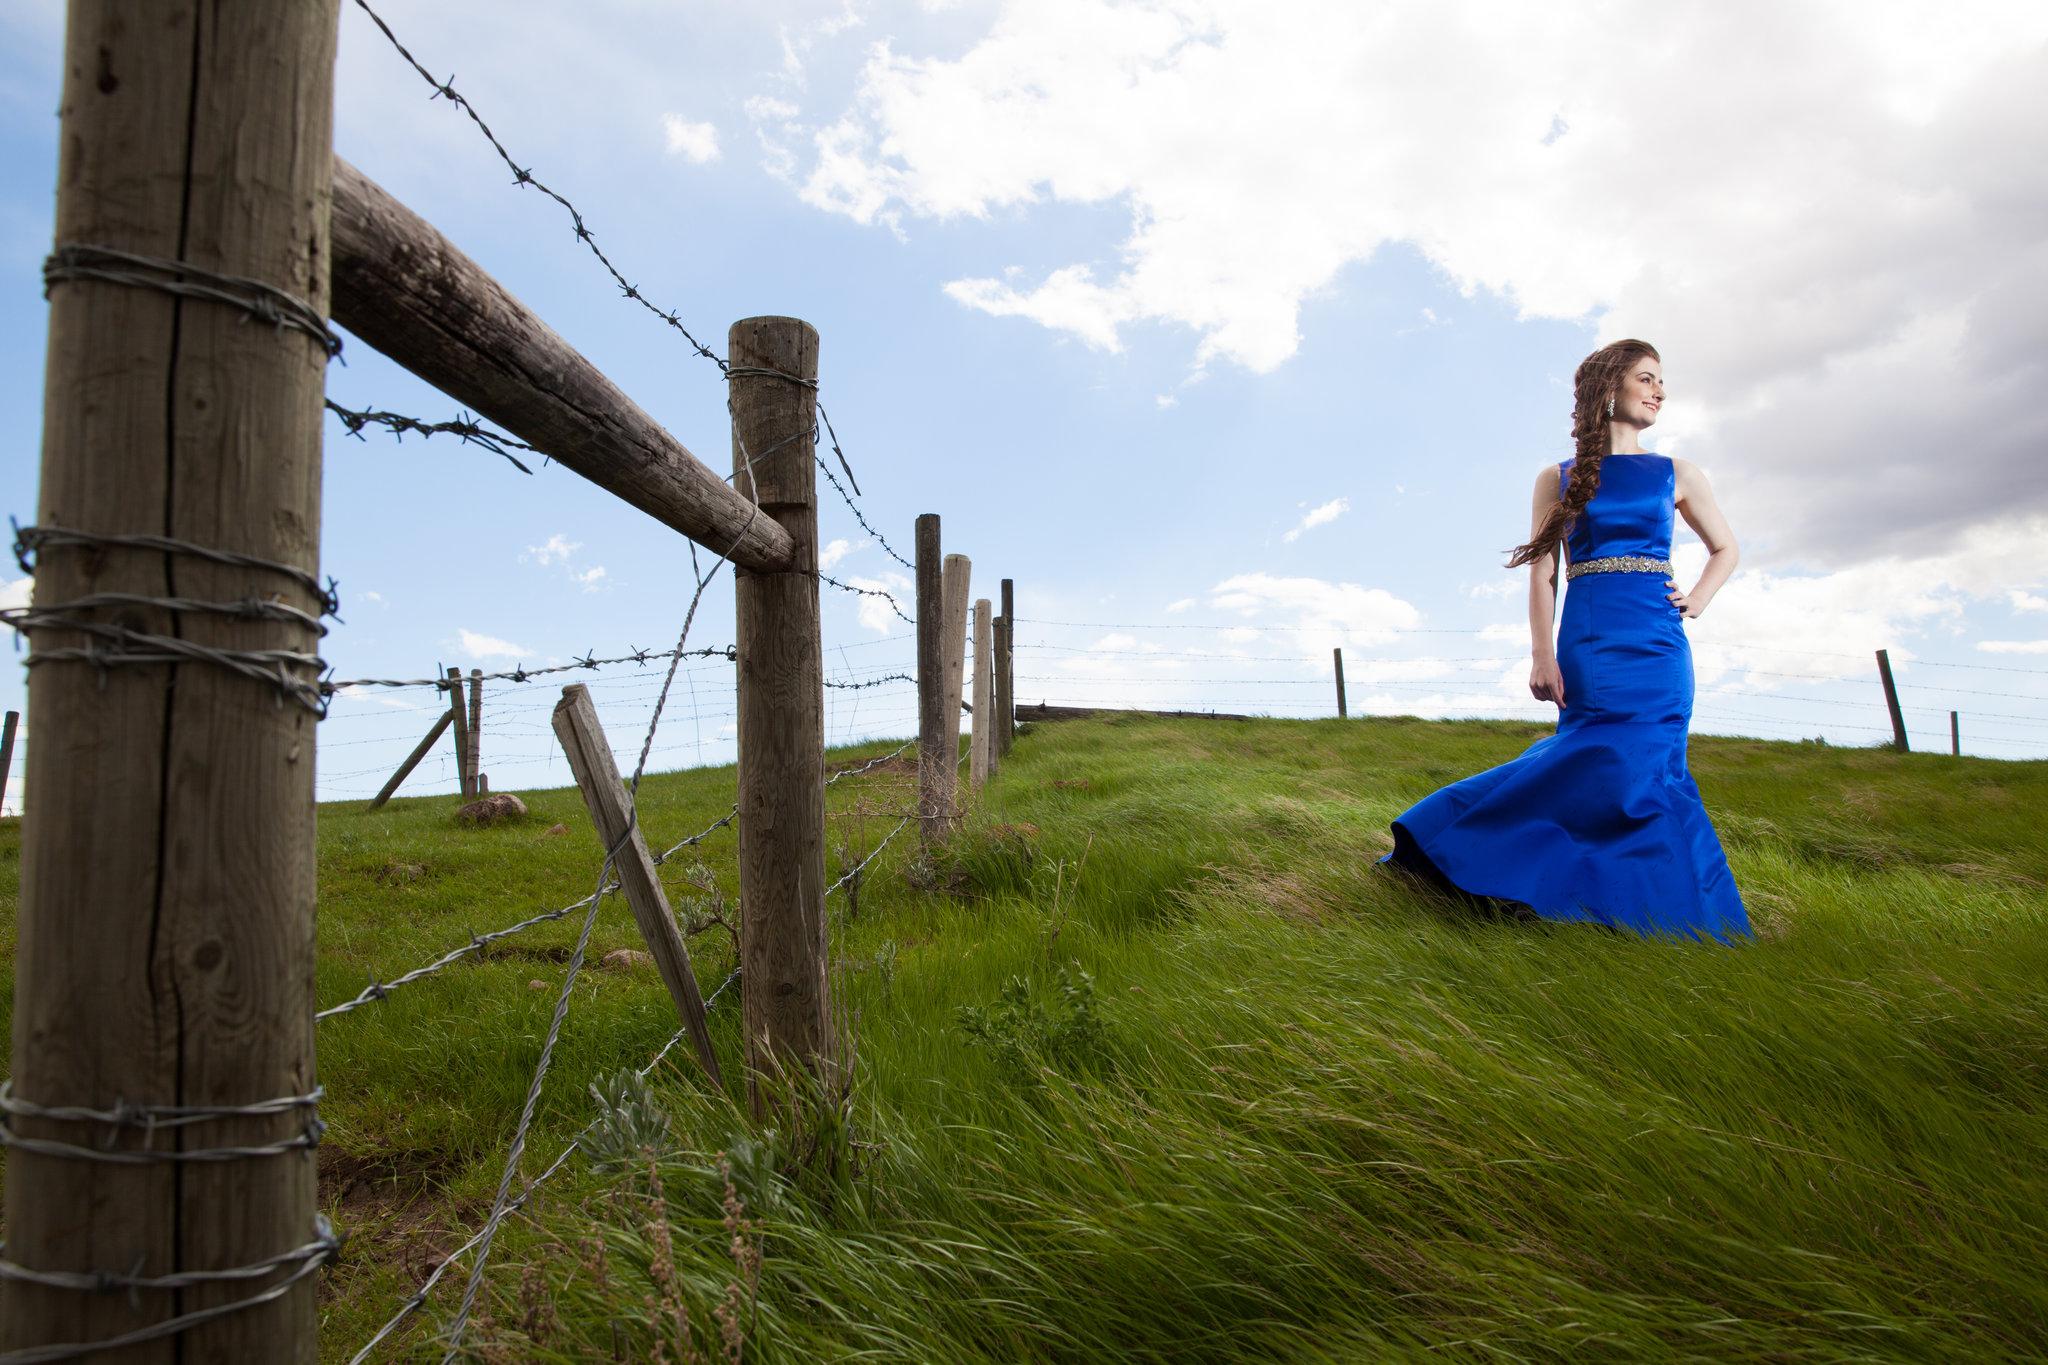 Chasing Autumn Photography,Medicine Hat Photography, Medicine Hat Grad Photography, Fox Valley Grad Photography, Southern Saskatchewan Grad Photographer, Alberta Grad Photographer